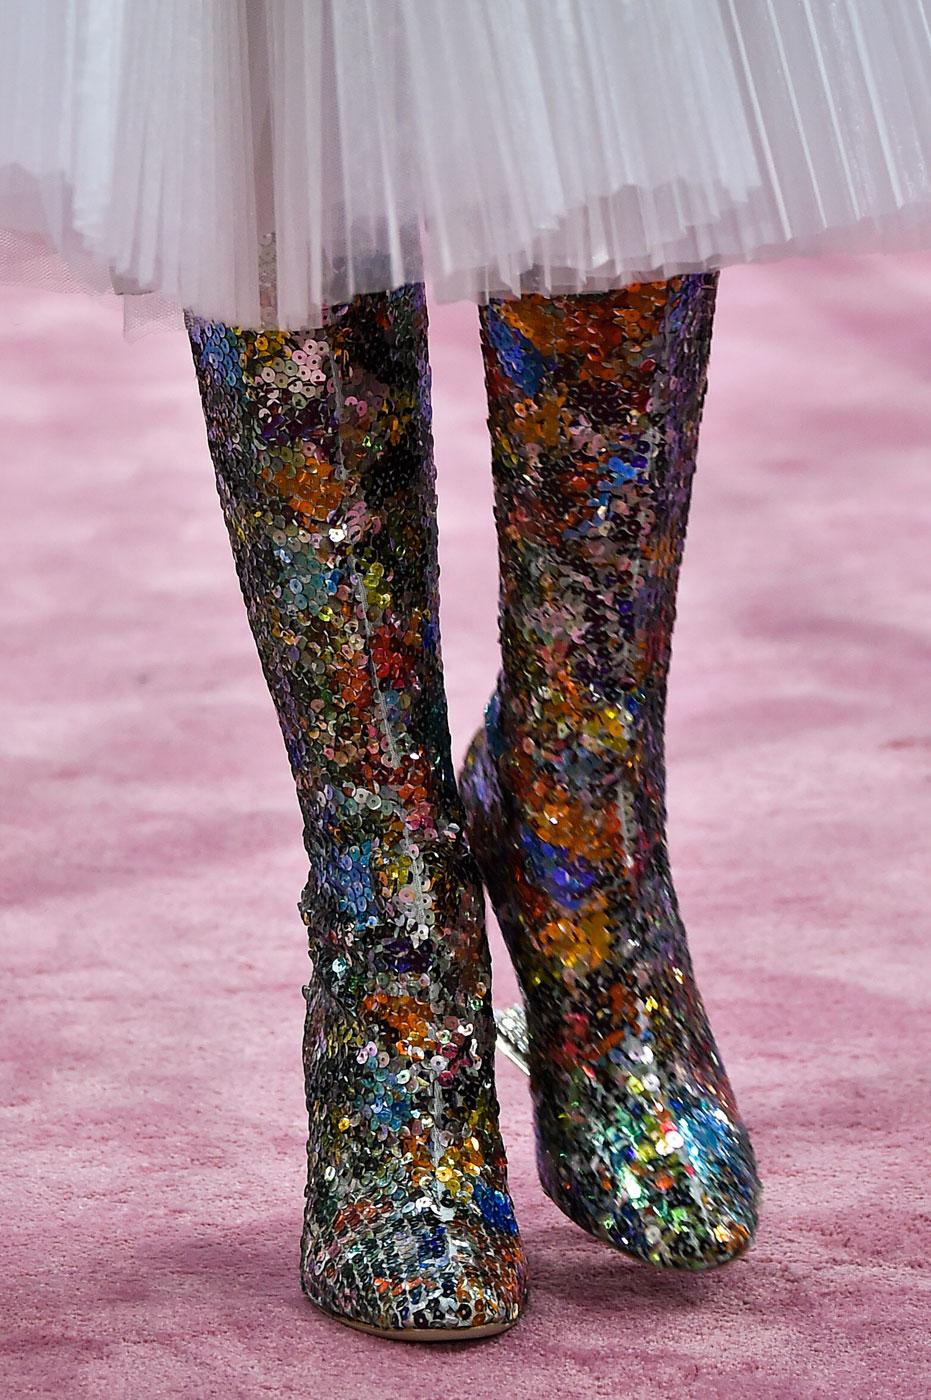 Christian-Dior-fashion-runway-show-close-ups-haute-couture-paris-spring-summer-2015-the-impression-131